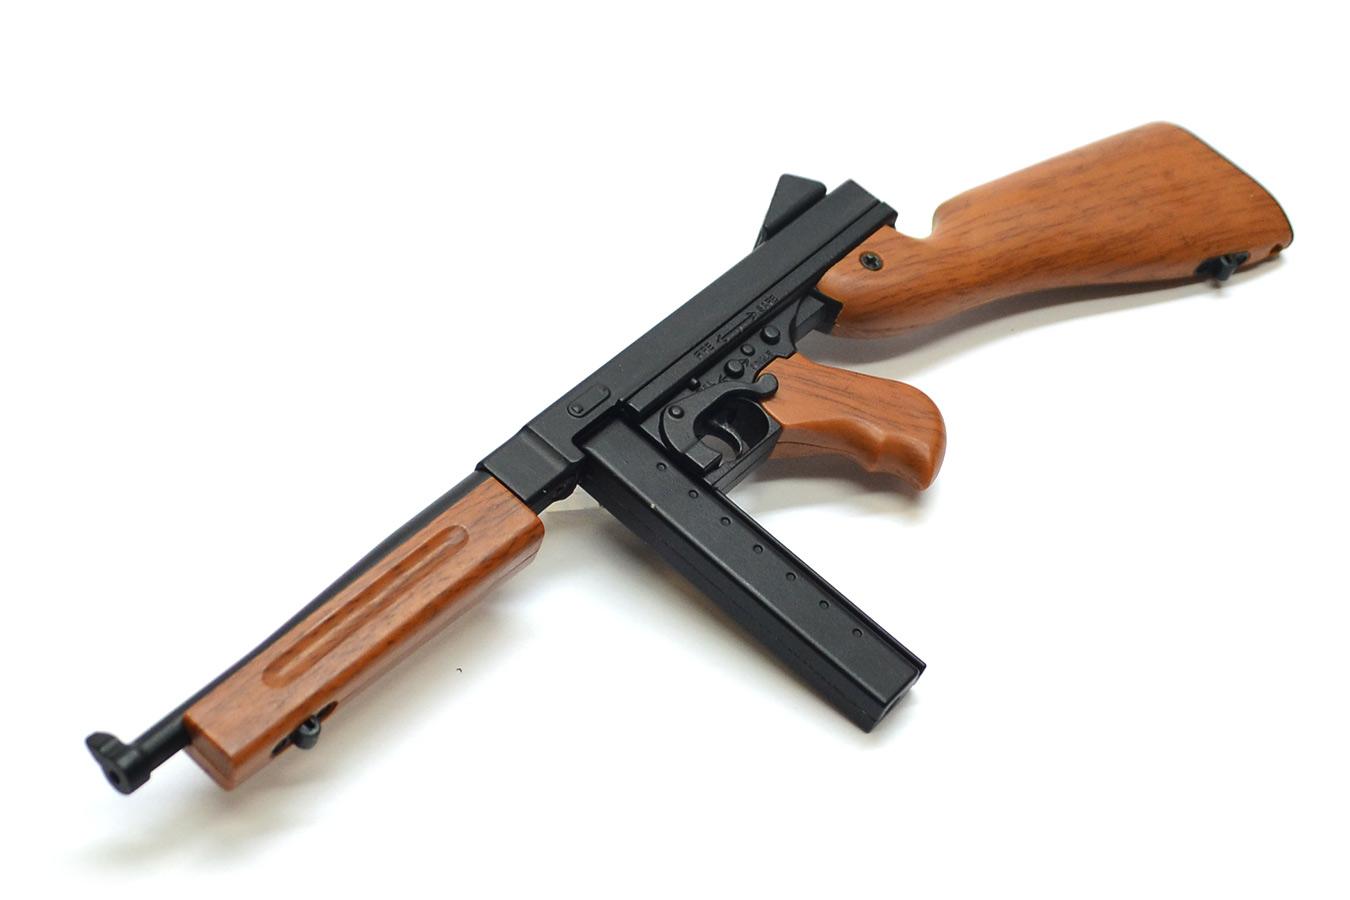 Пистолет-пулемёт Томпсона изображение 0